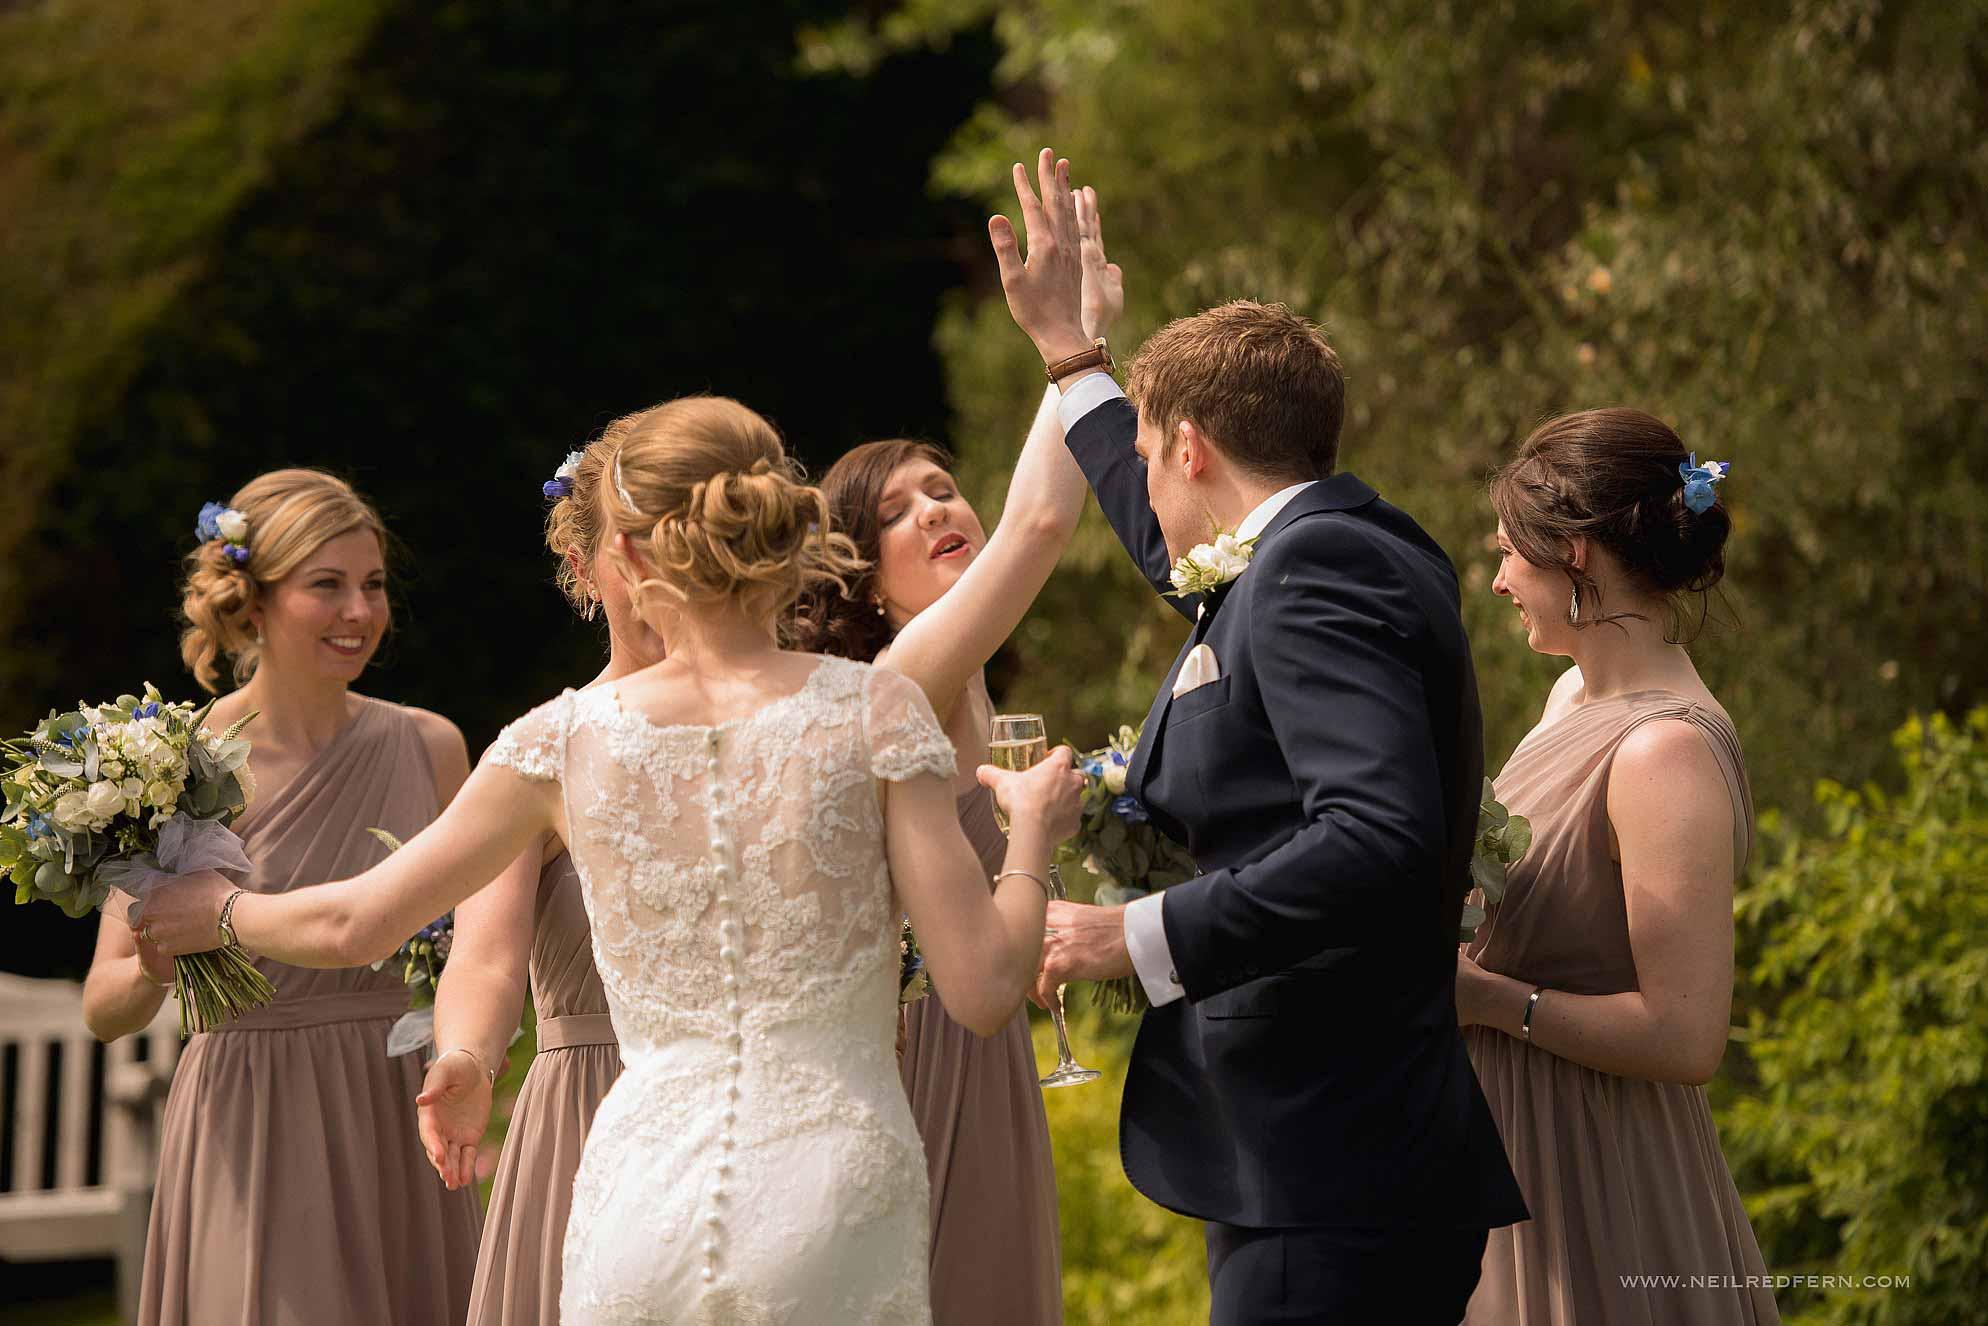 outdoor-wedding-ceremony-in-cheshire-9